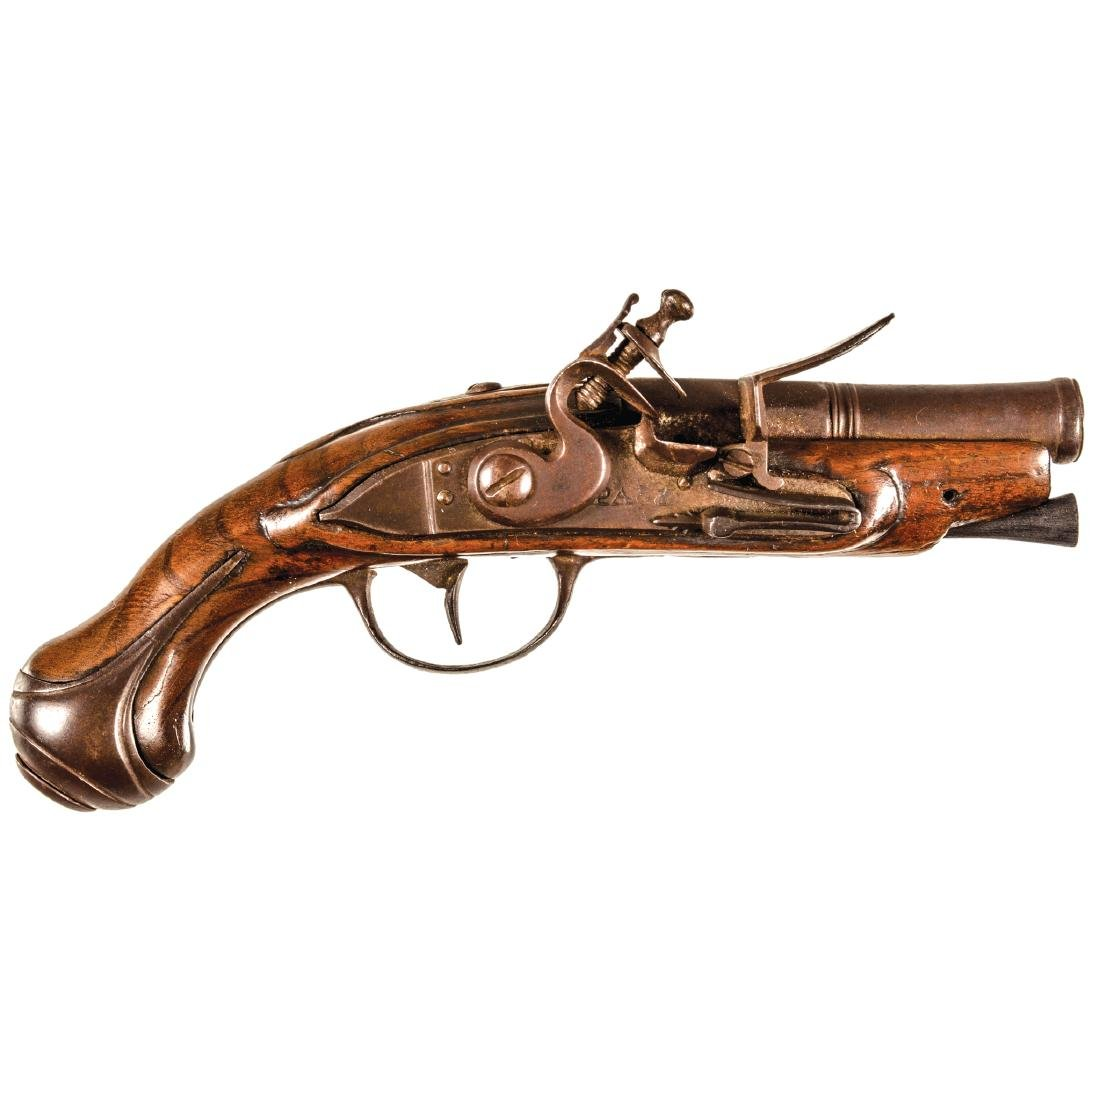 c 1760-80 LE PAGE French Pocket Flintlock Pistol